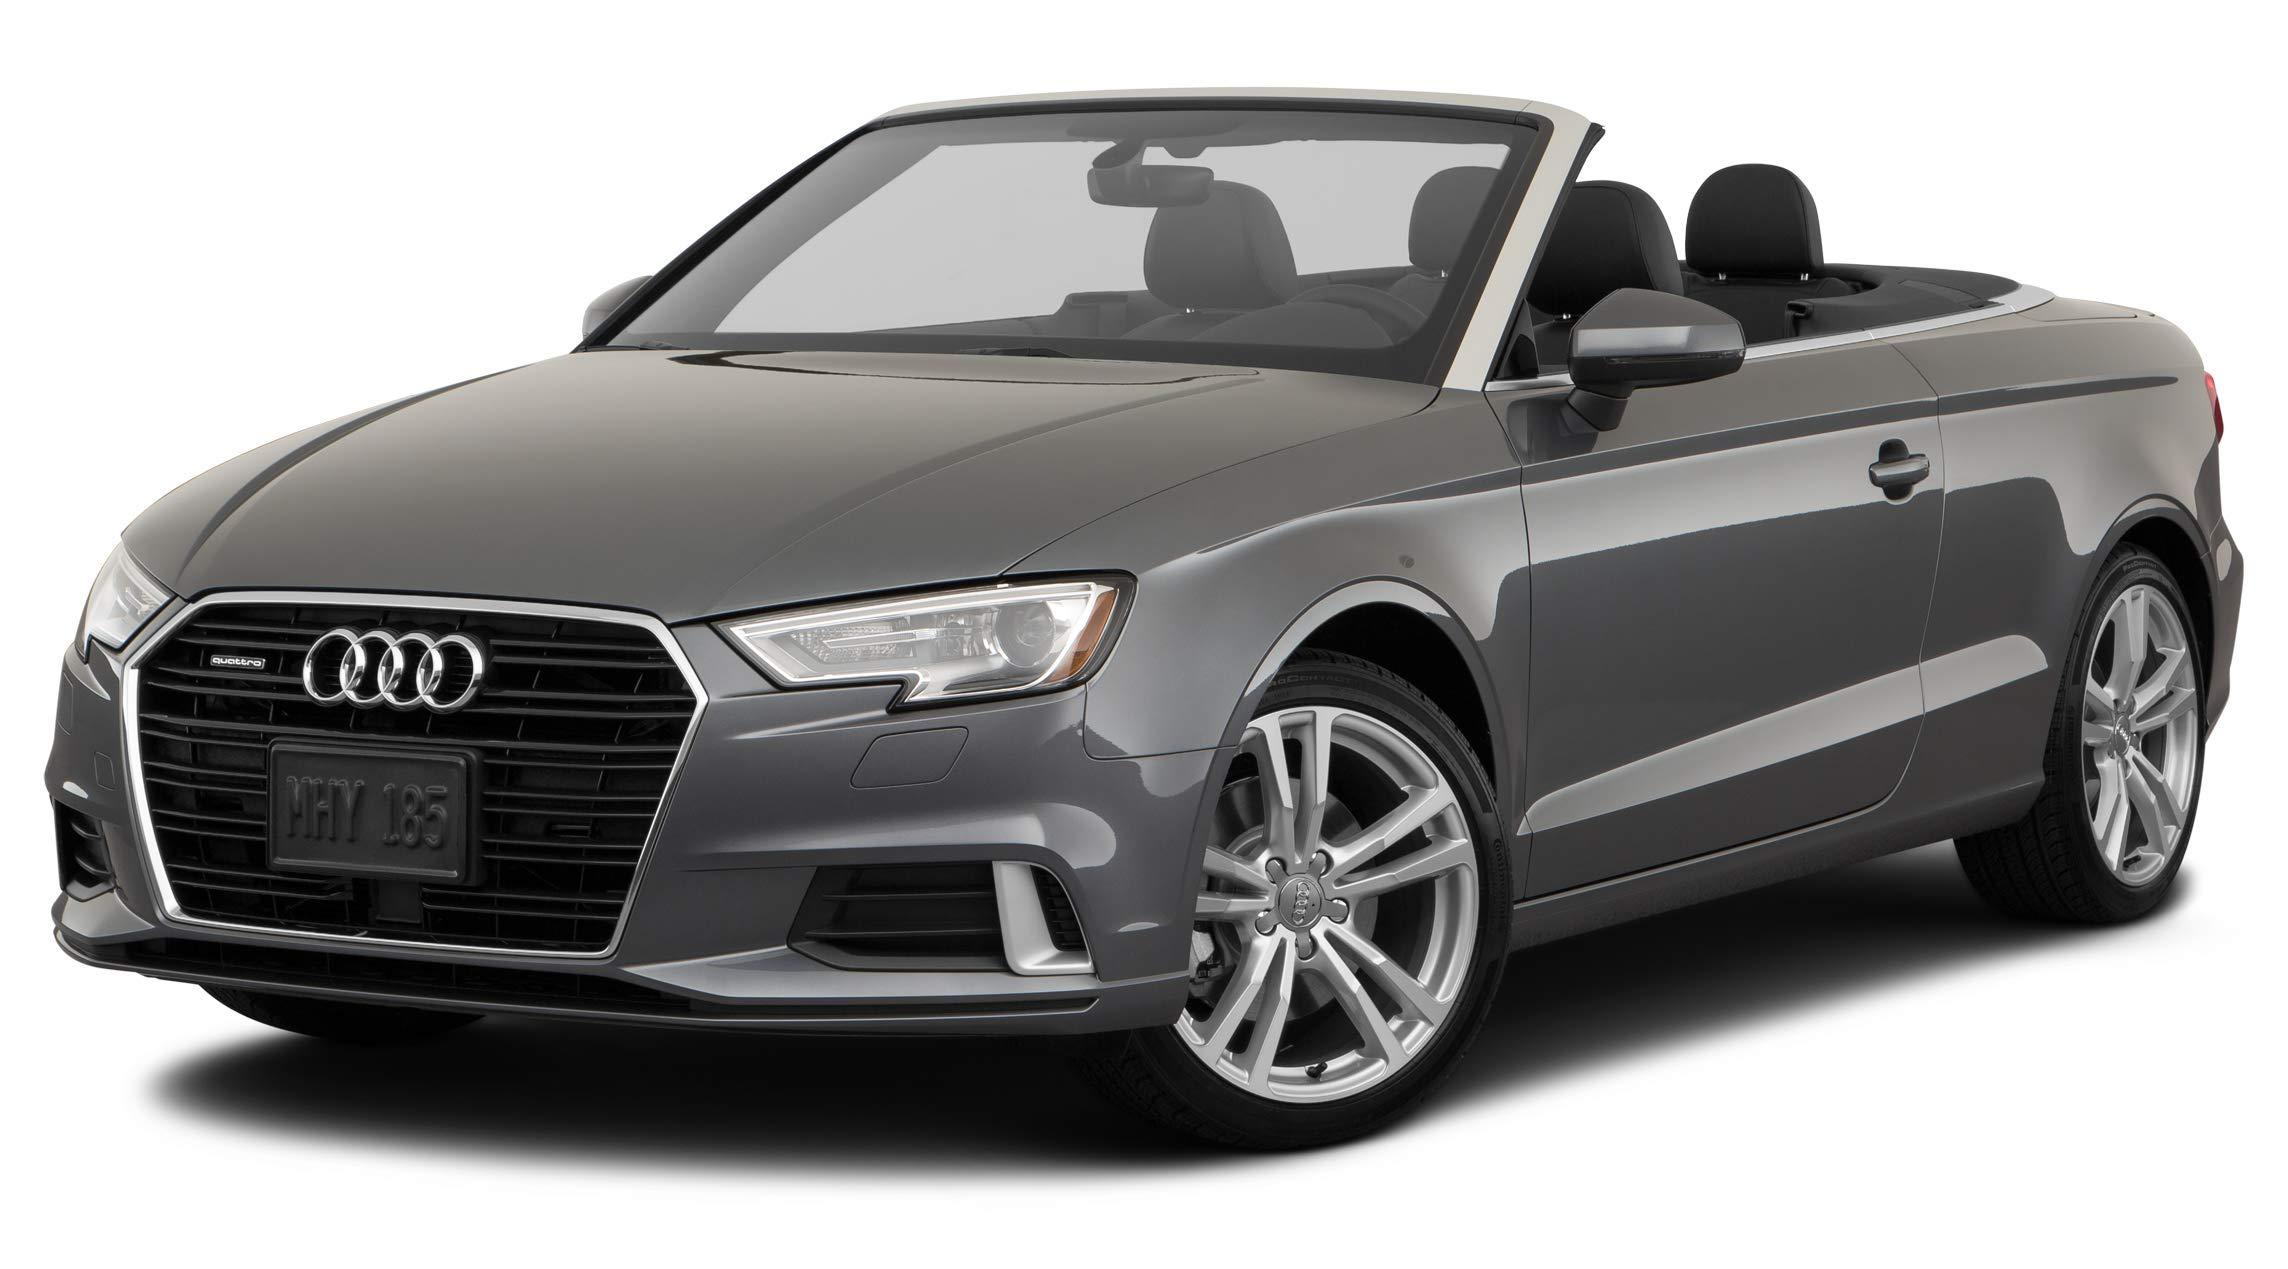 ... 2018 Audi A3 Premium, 2.0 TFSI Front Wheel Drive